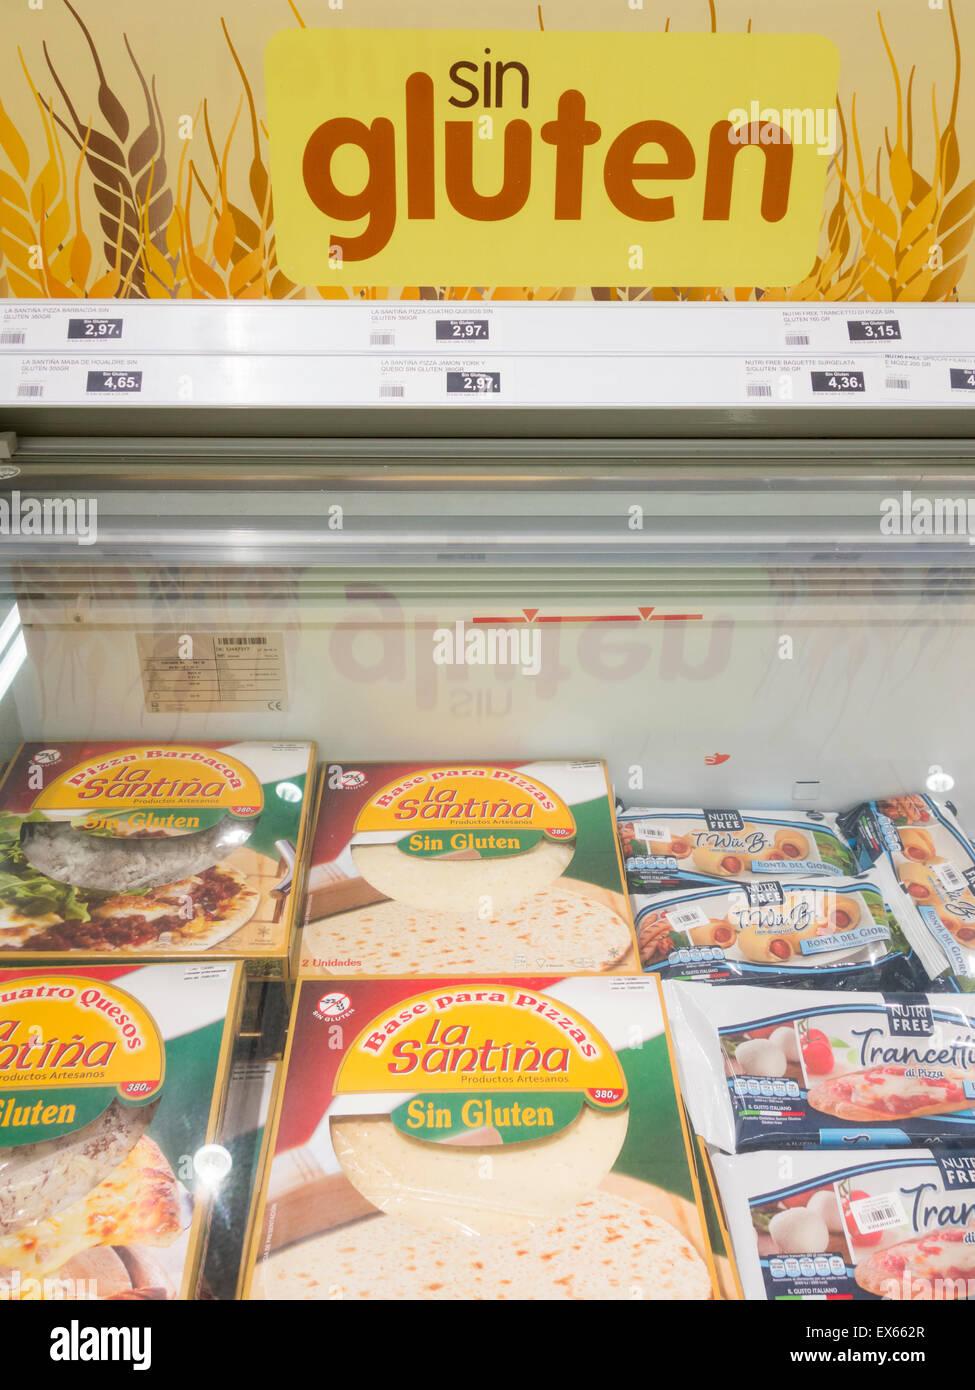 Gluten Free Sin Gluten In Spanish Frozen Pizza Bases In Spanish Stock Photo Alamy